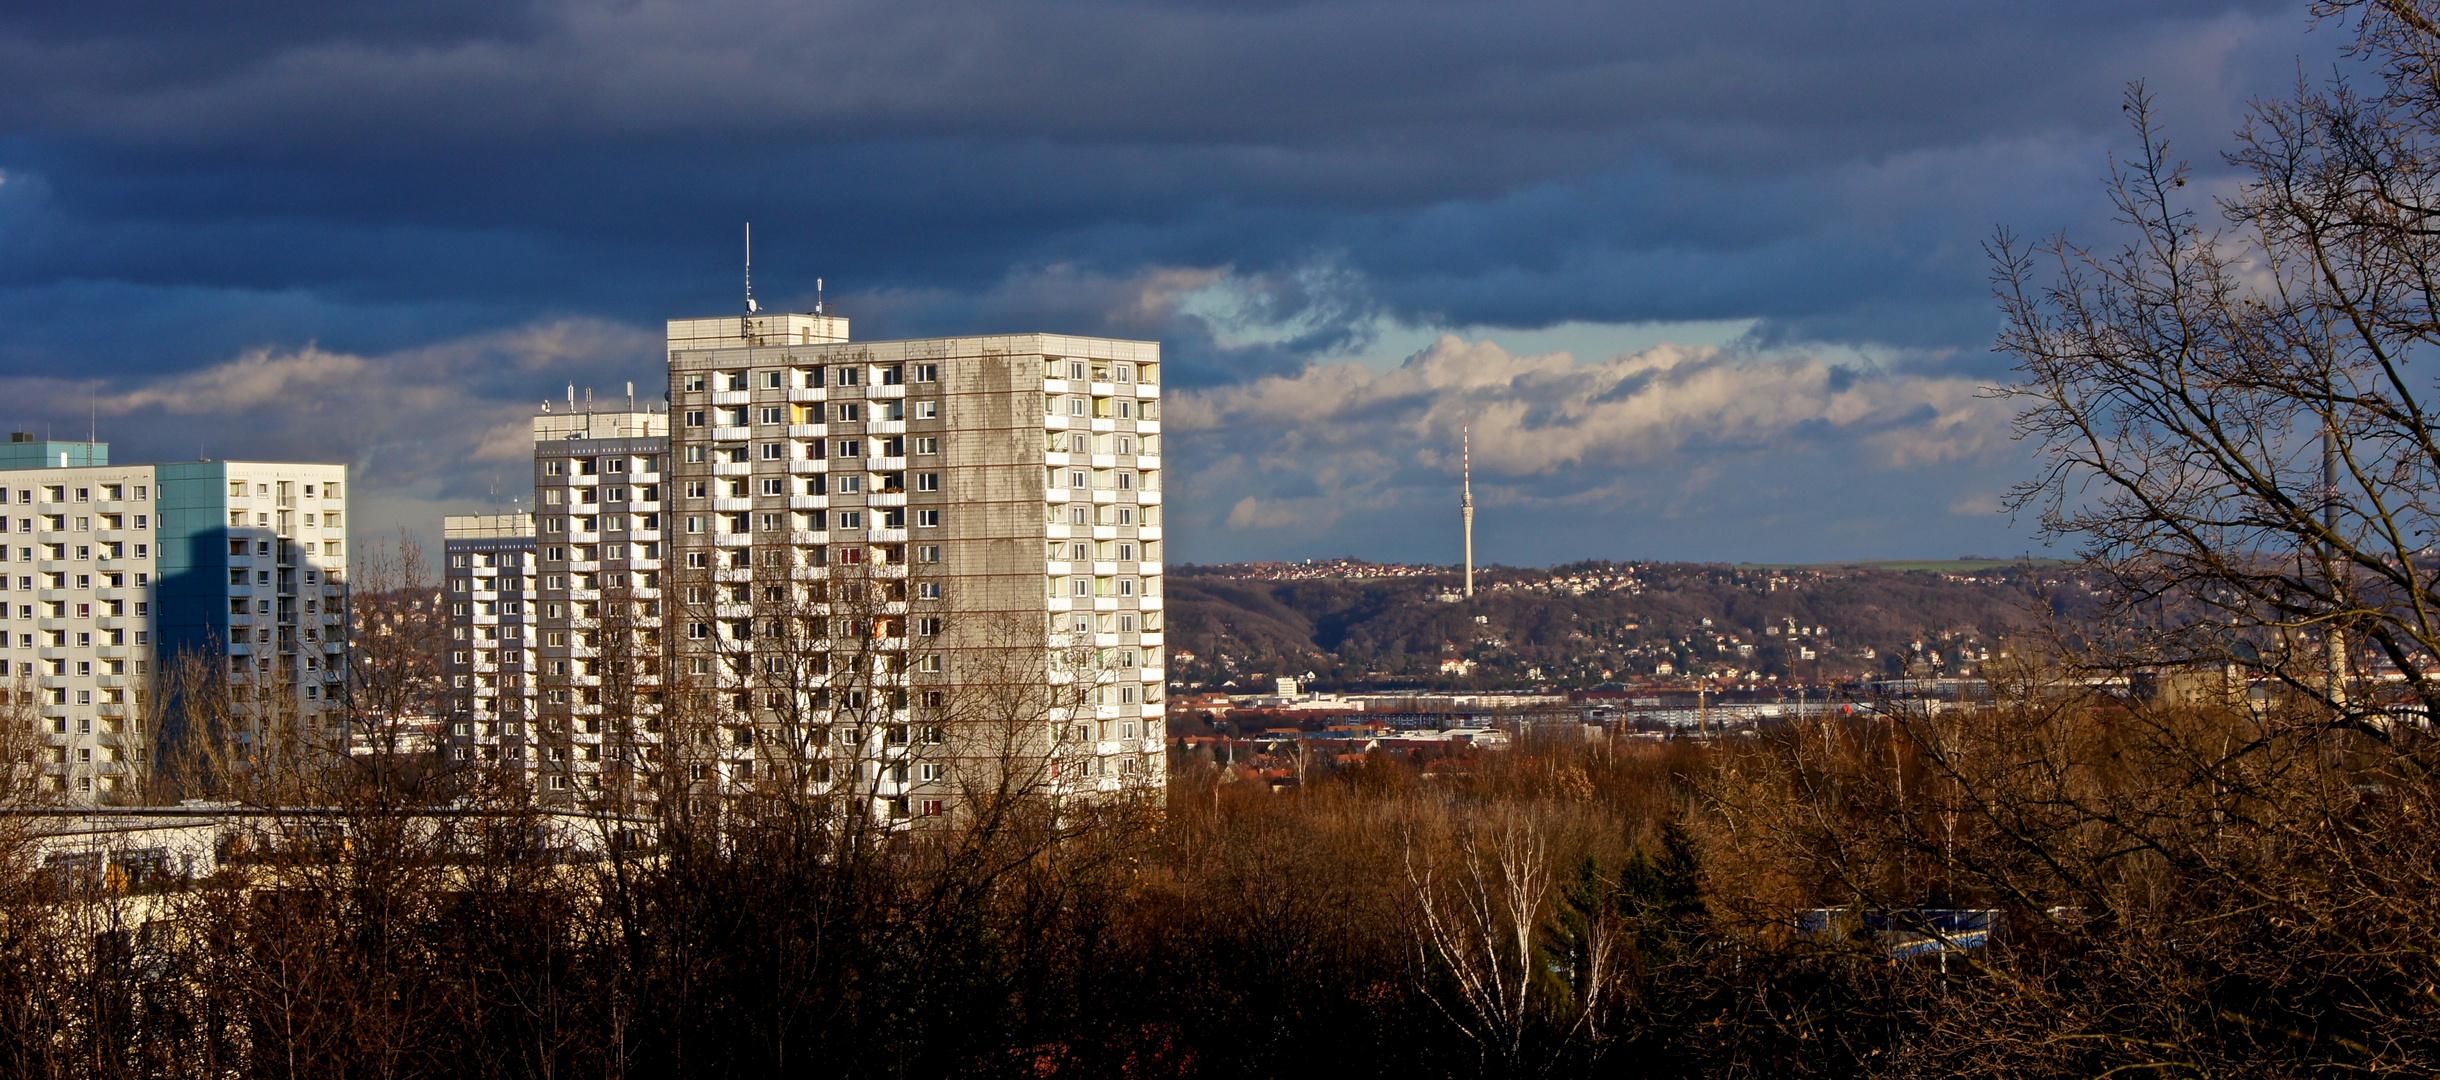 Dresdner Fernsehturm